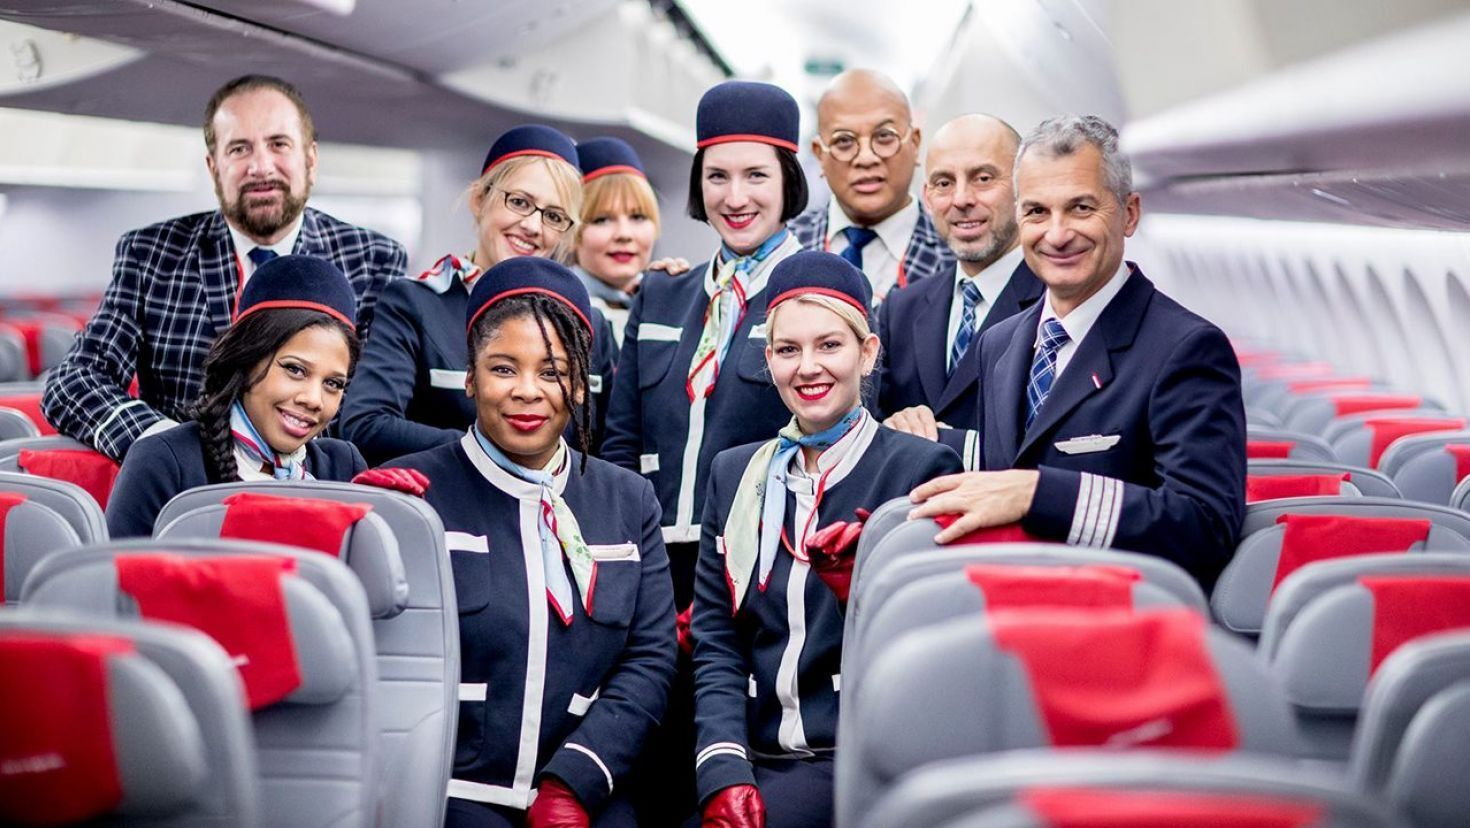 Norwegian Air Drops Makeup High Heels Requirements For Flight